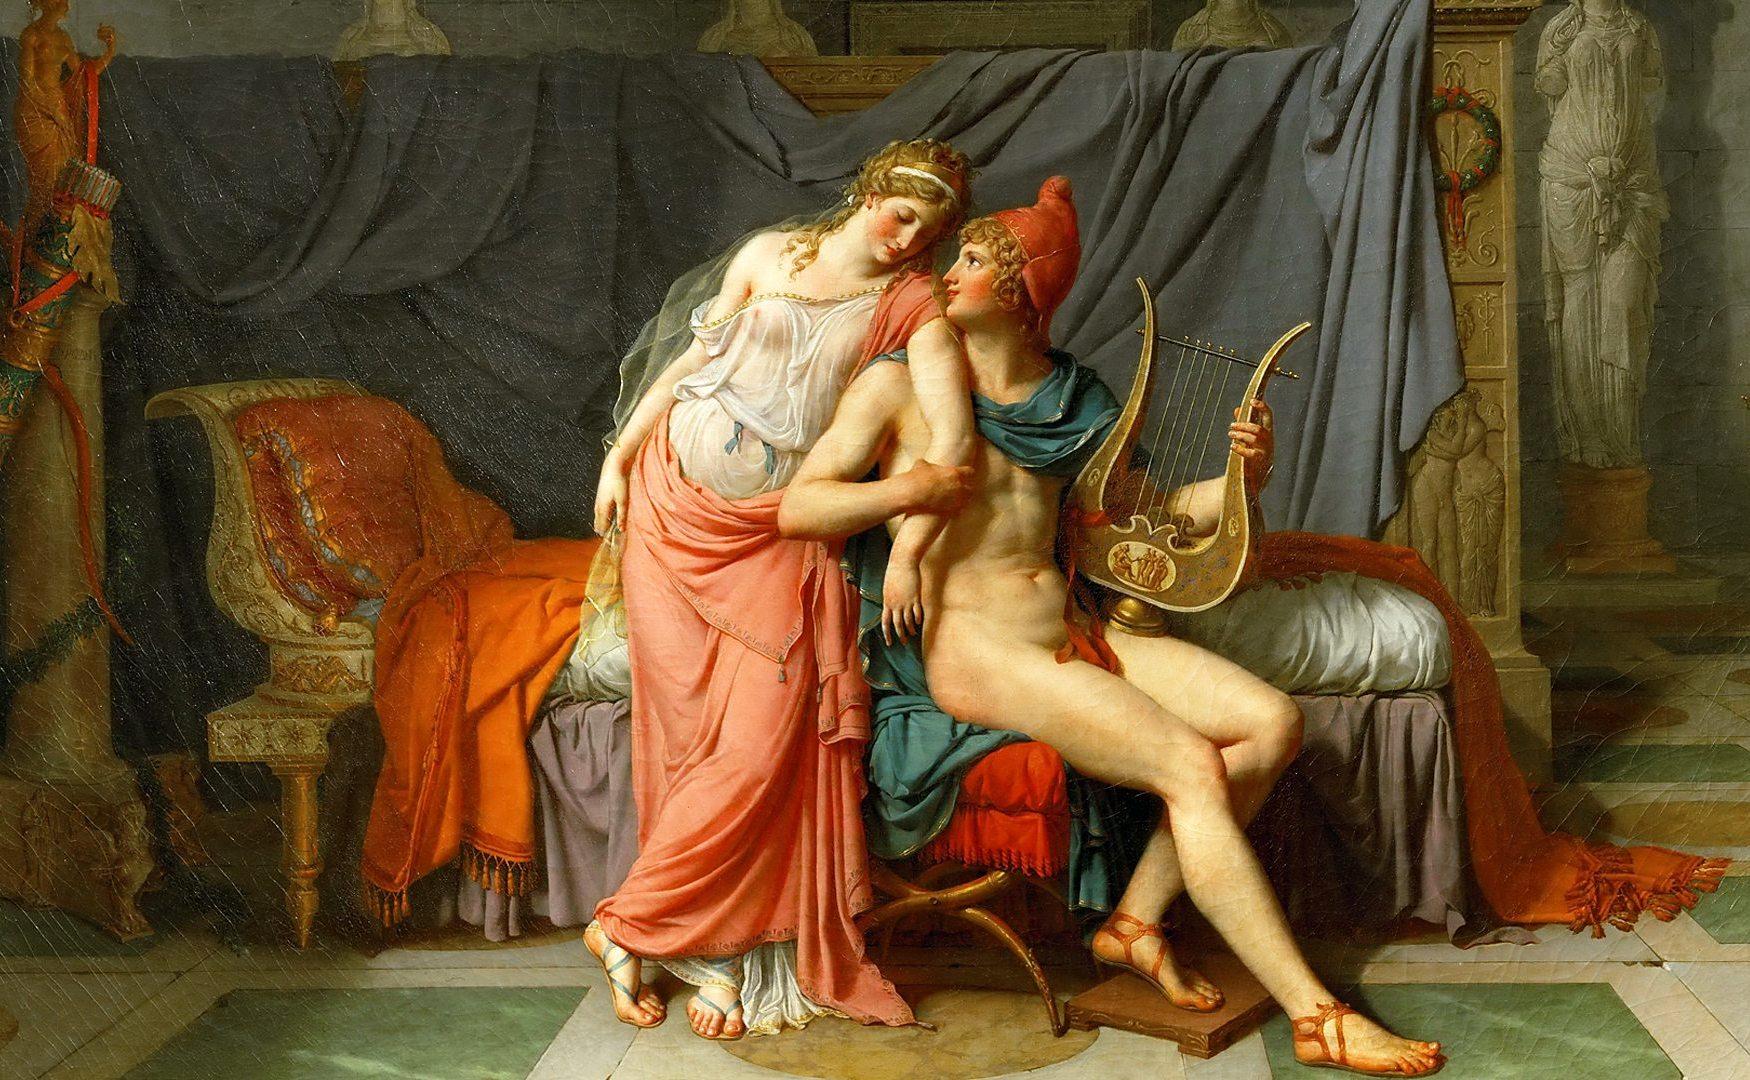 alleged historical sex offen - HD1244×768